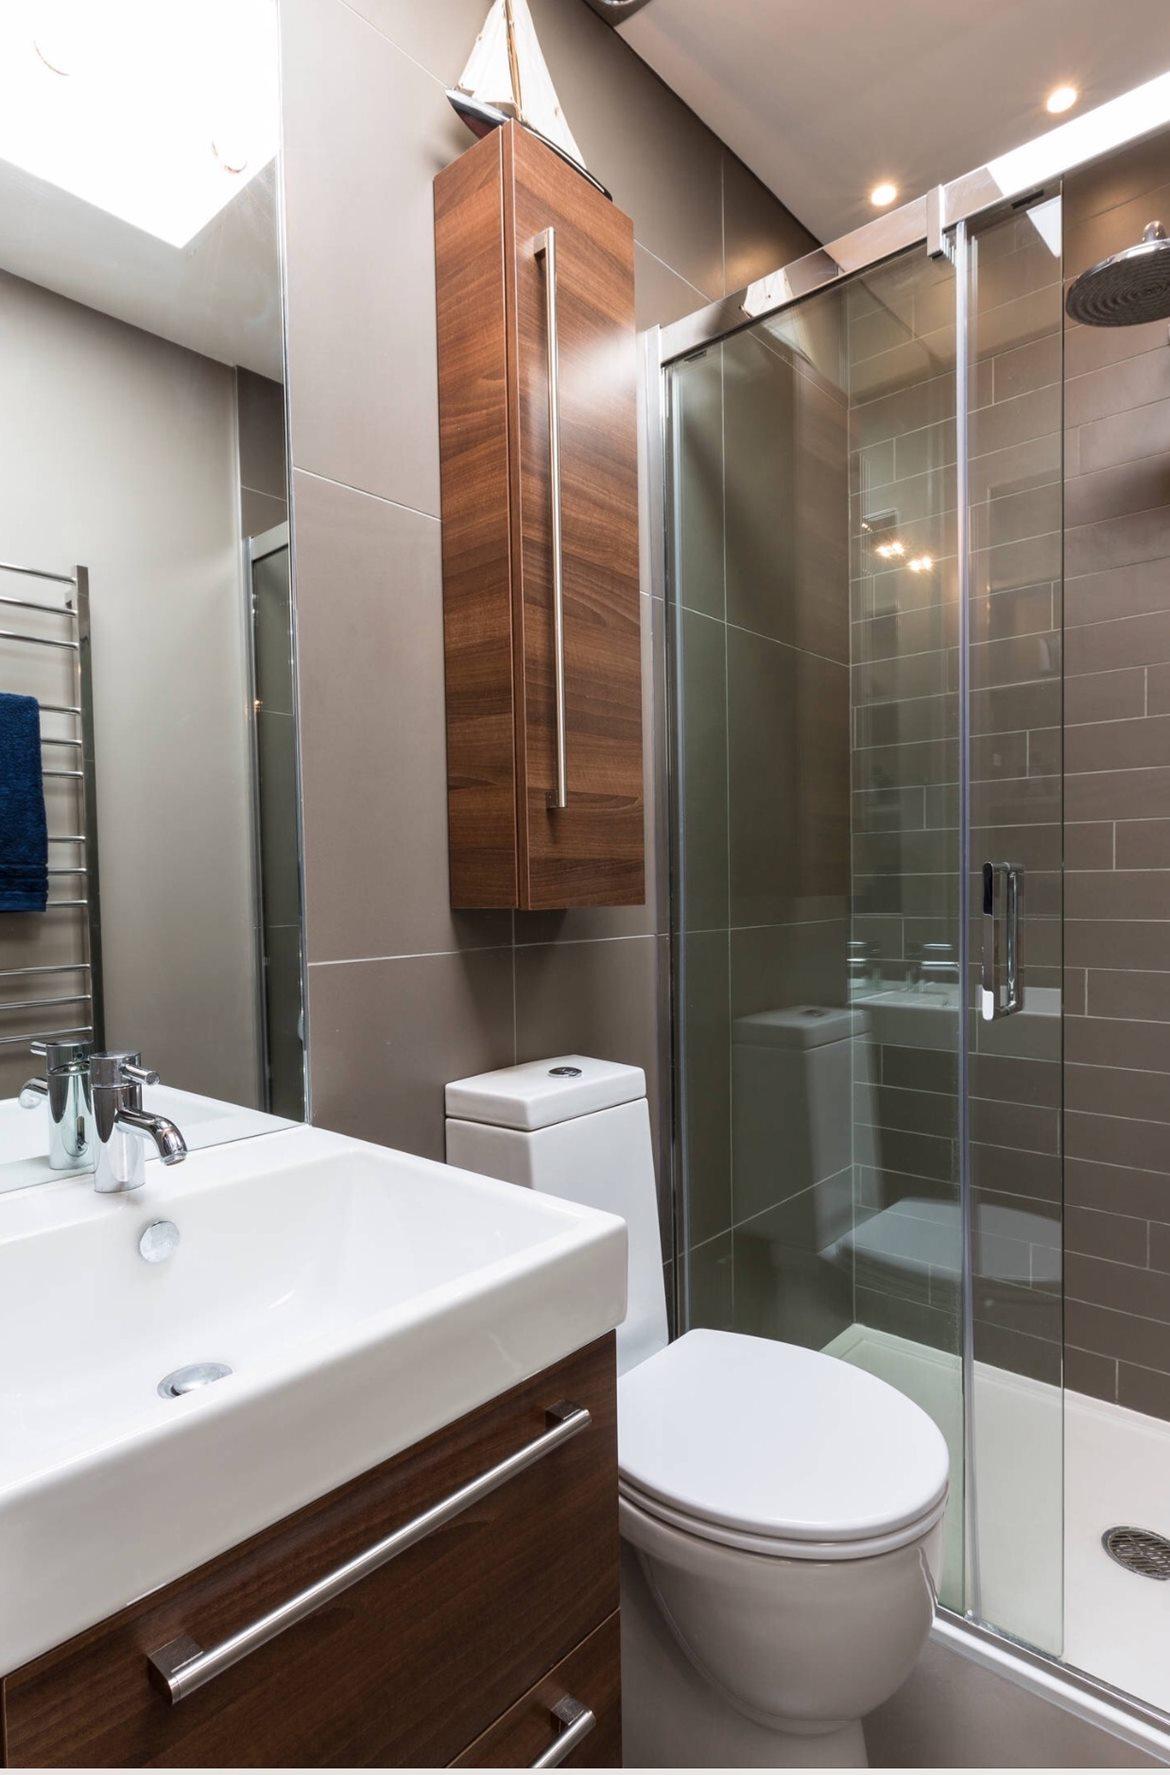 Contractors Howard Beach Bathroom Remodeling Howard Beach Queens Ny Bathroom Remodeling